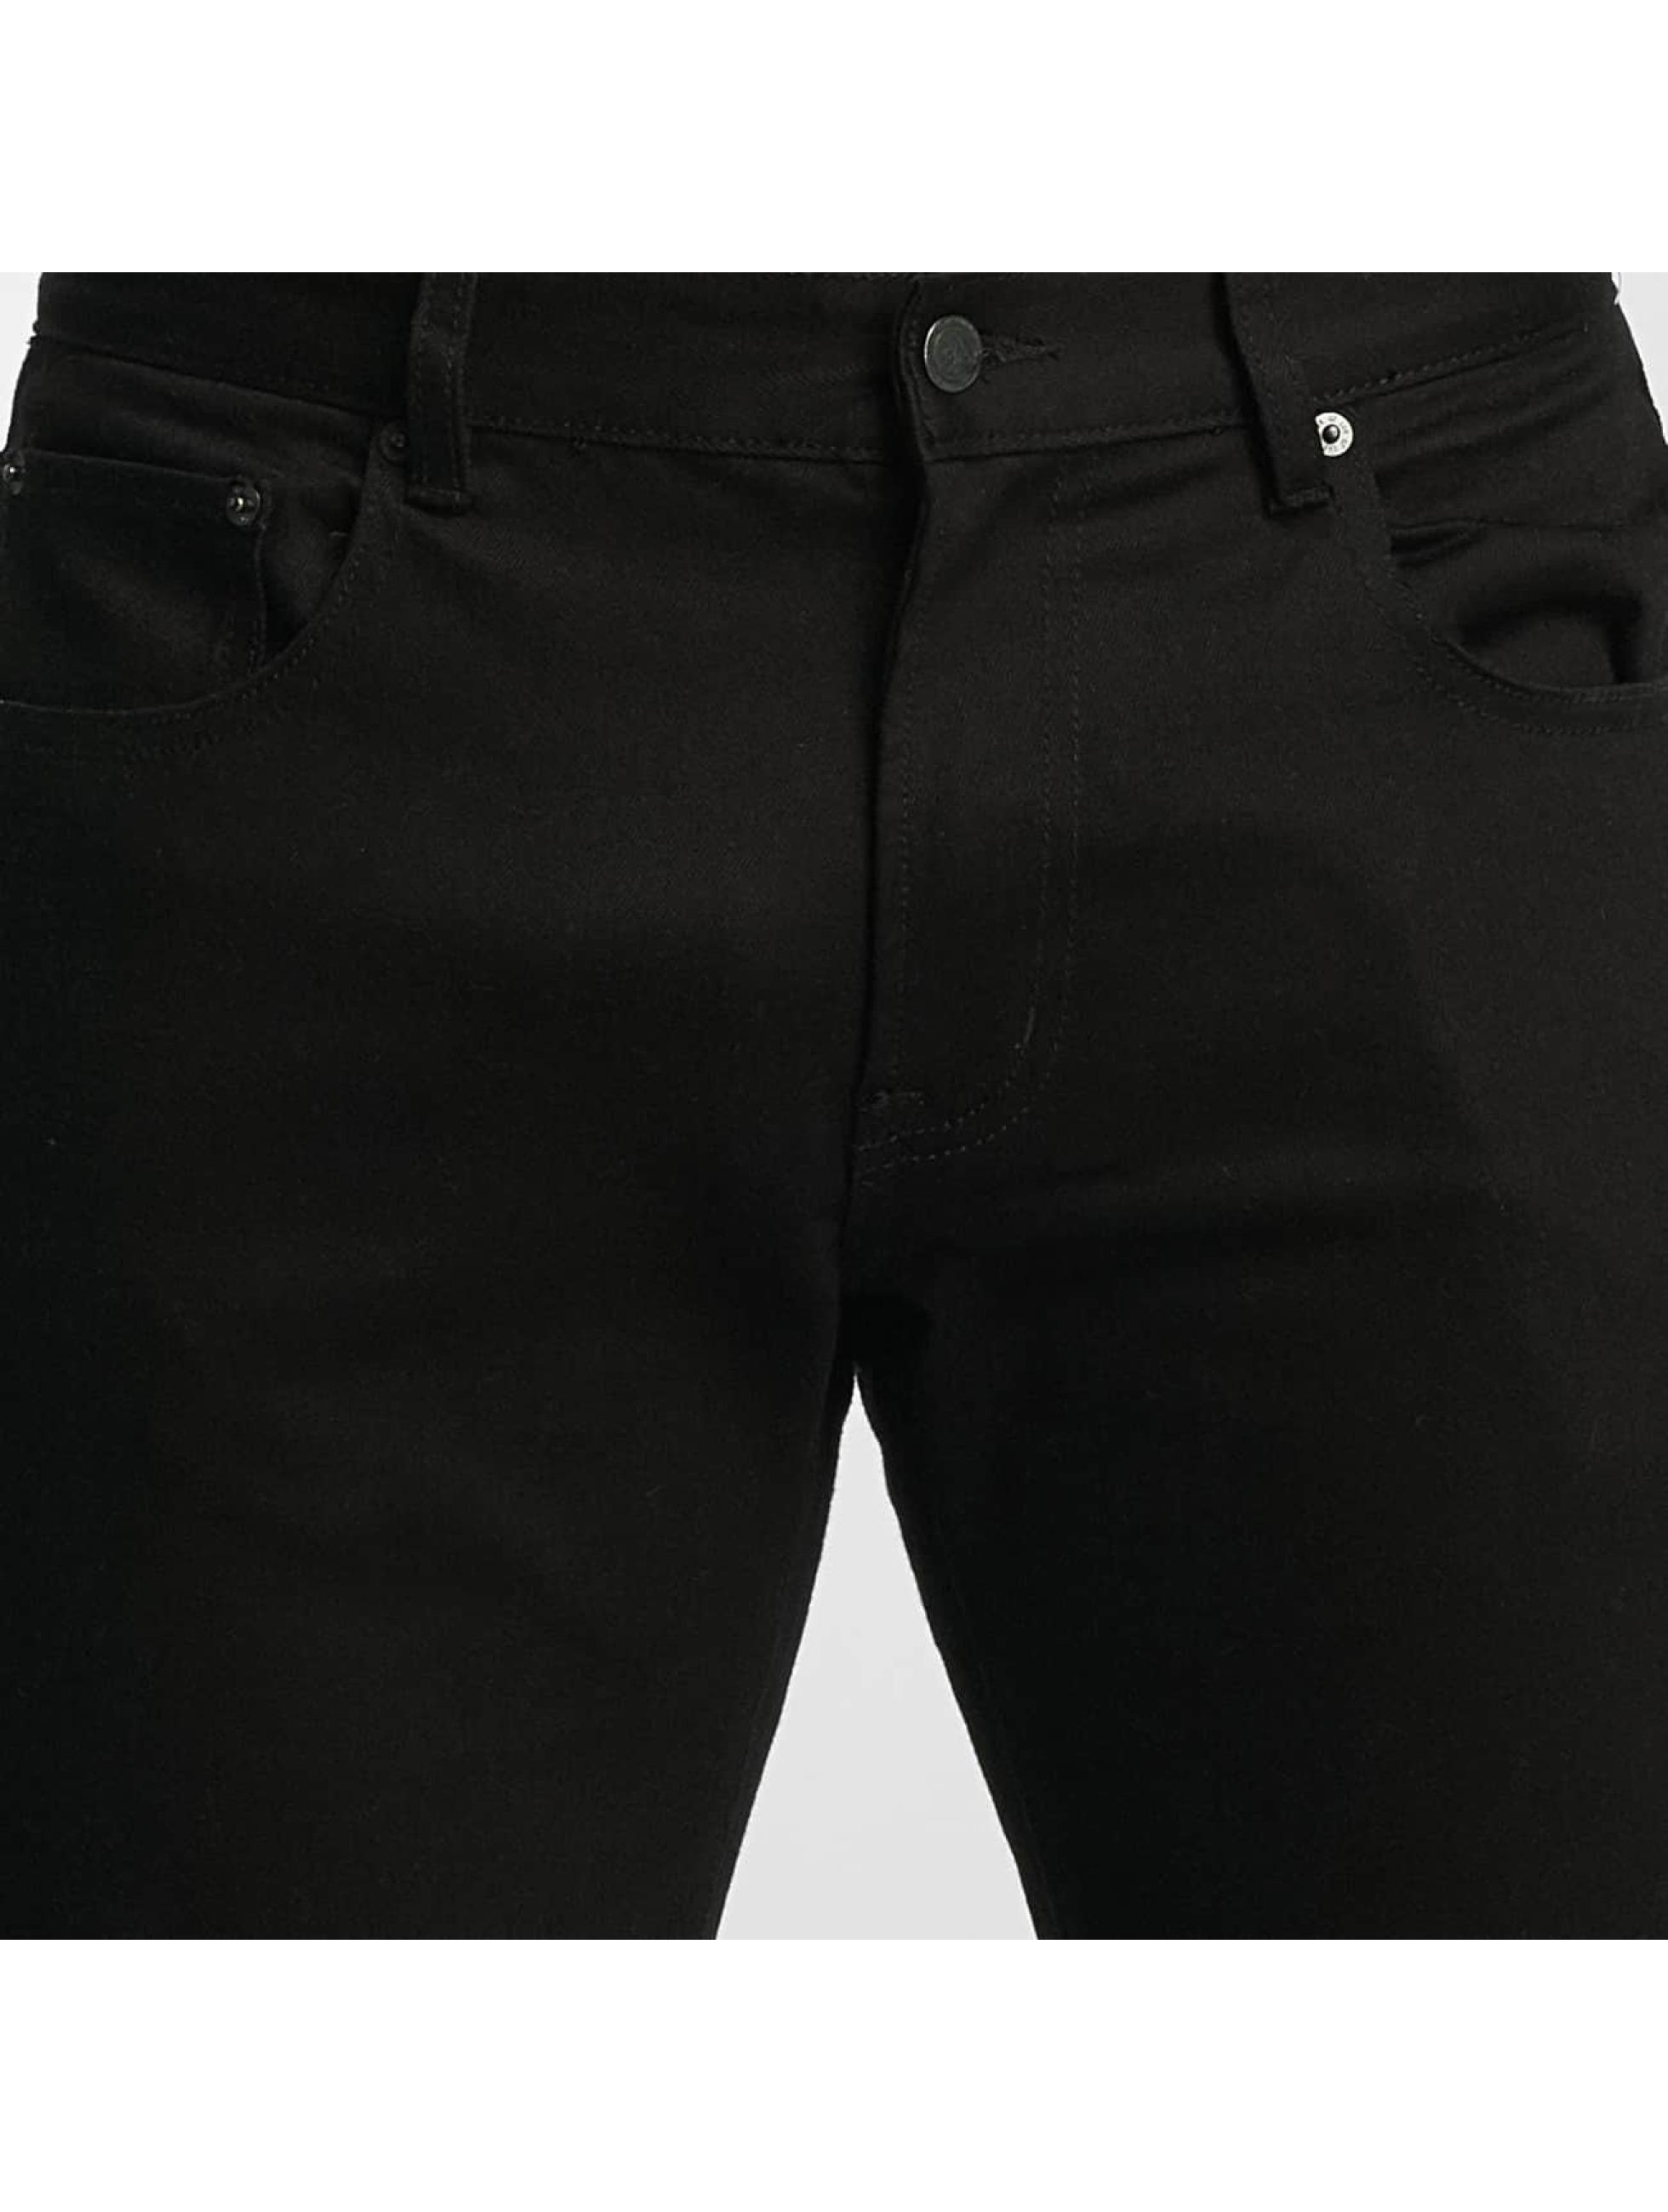 LRG Jean coupe droite Research Collection noir